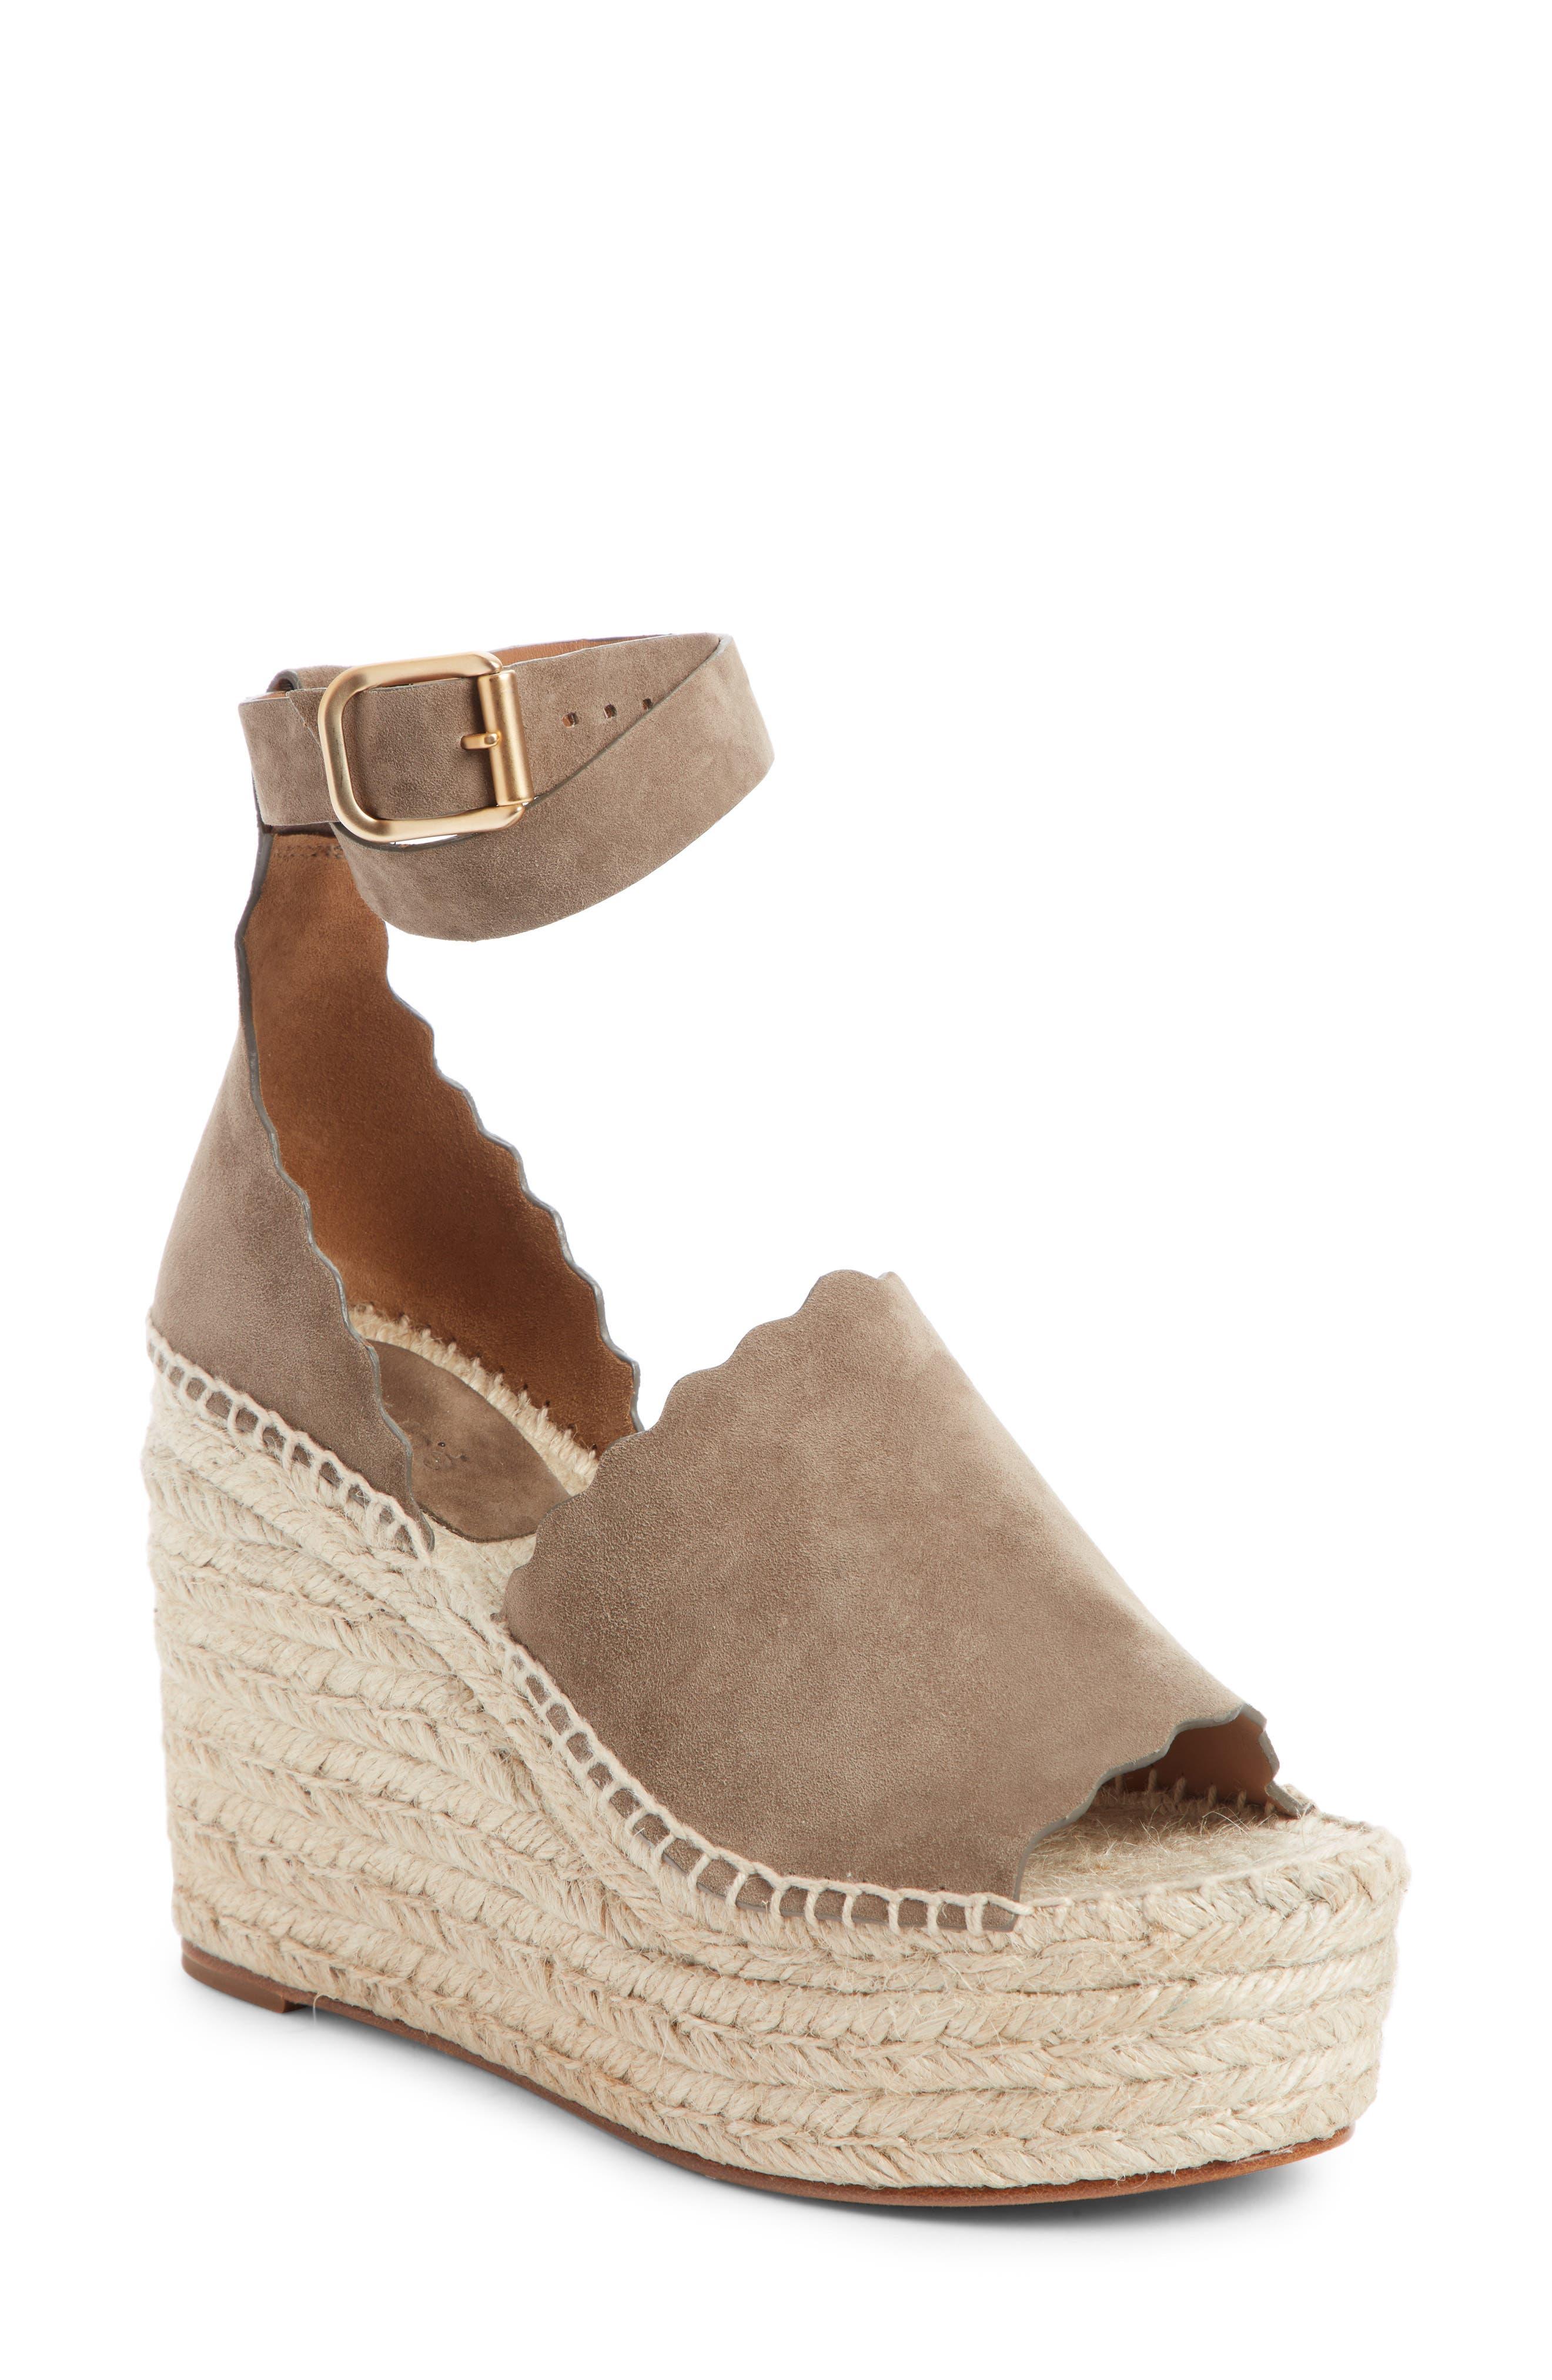 Lauren Espadrille Wedge Sandal,                         Main,                         color, MAPLE BROWN SUEDE